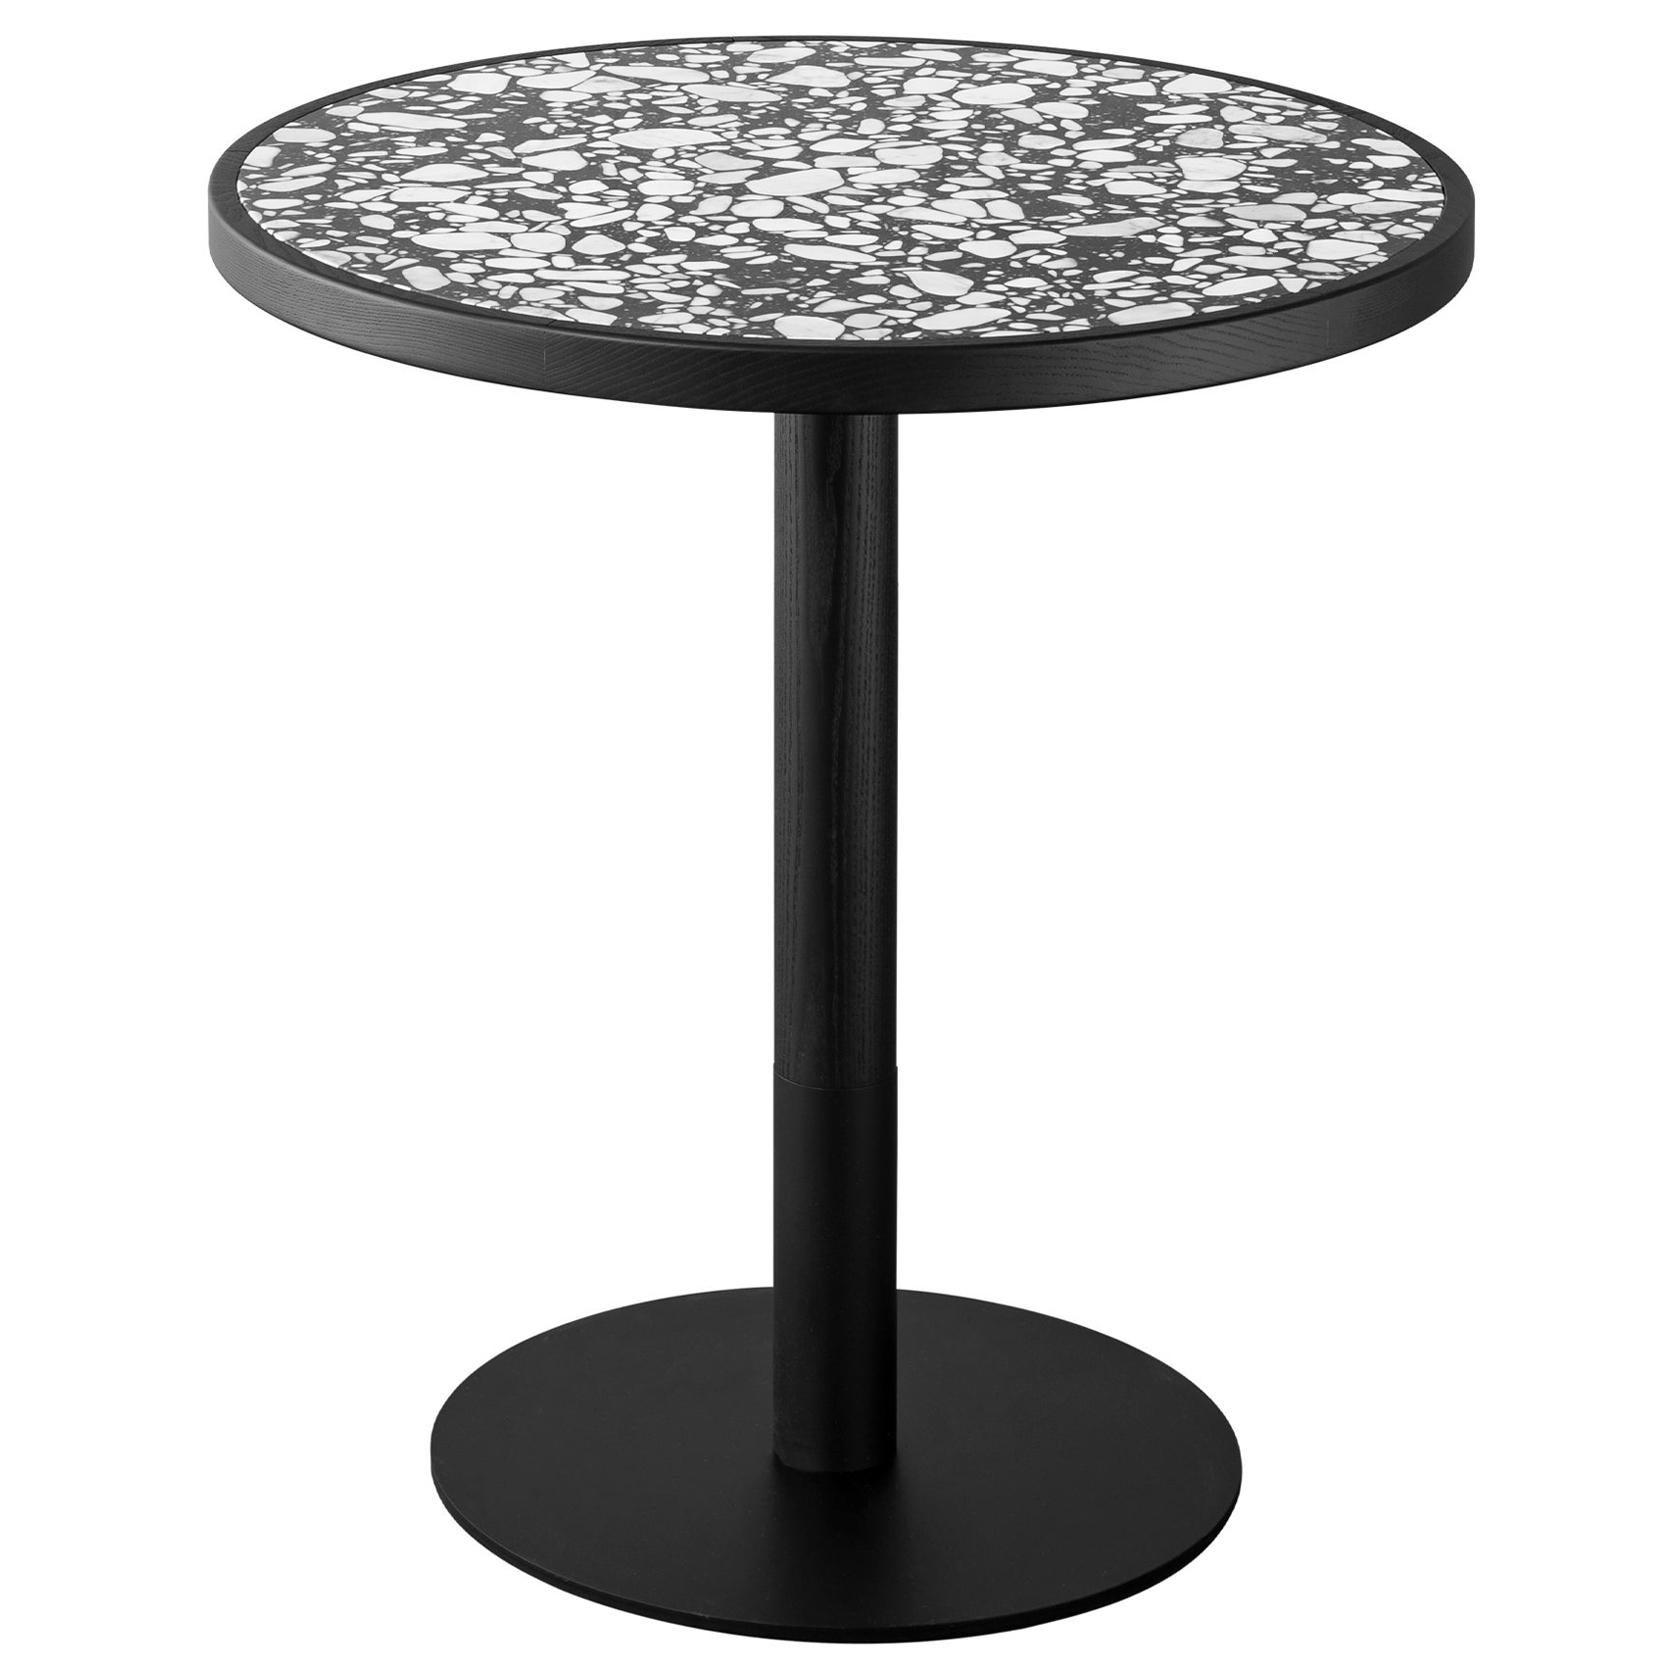 Briscola Table with Palladio Moro Marble Top & Ash Base by Miniforms Lab